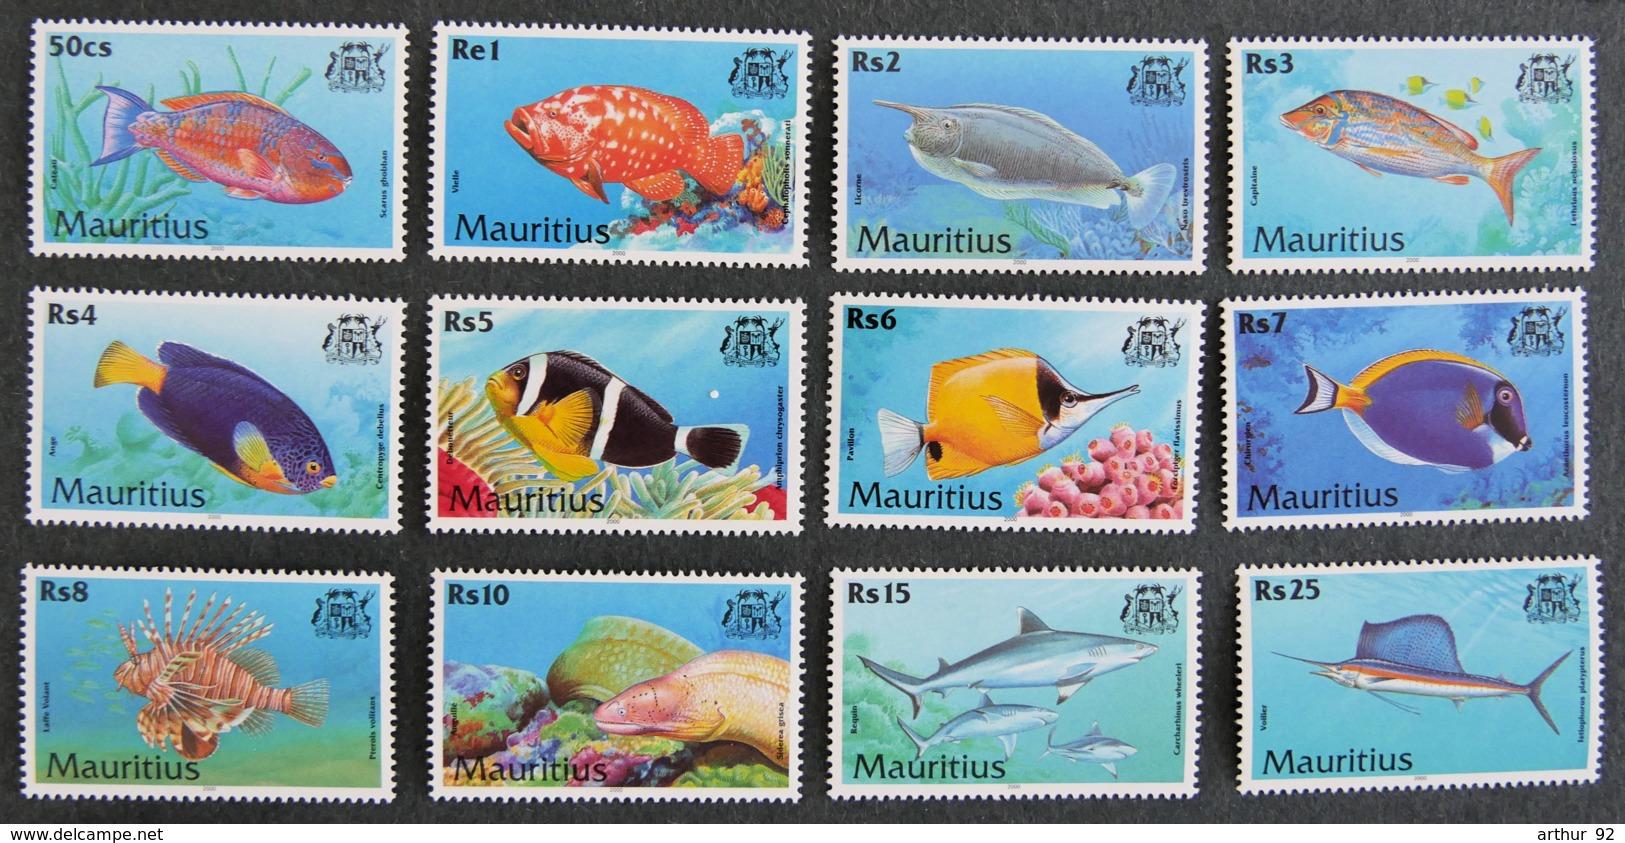 ILE MAURICE - MAURITIUS - 2000 - YT 946 à 957 ** - SERIE COURANTE - POISSONS - Mauritius (1968-...)